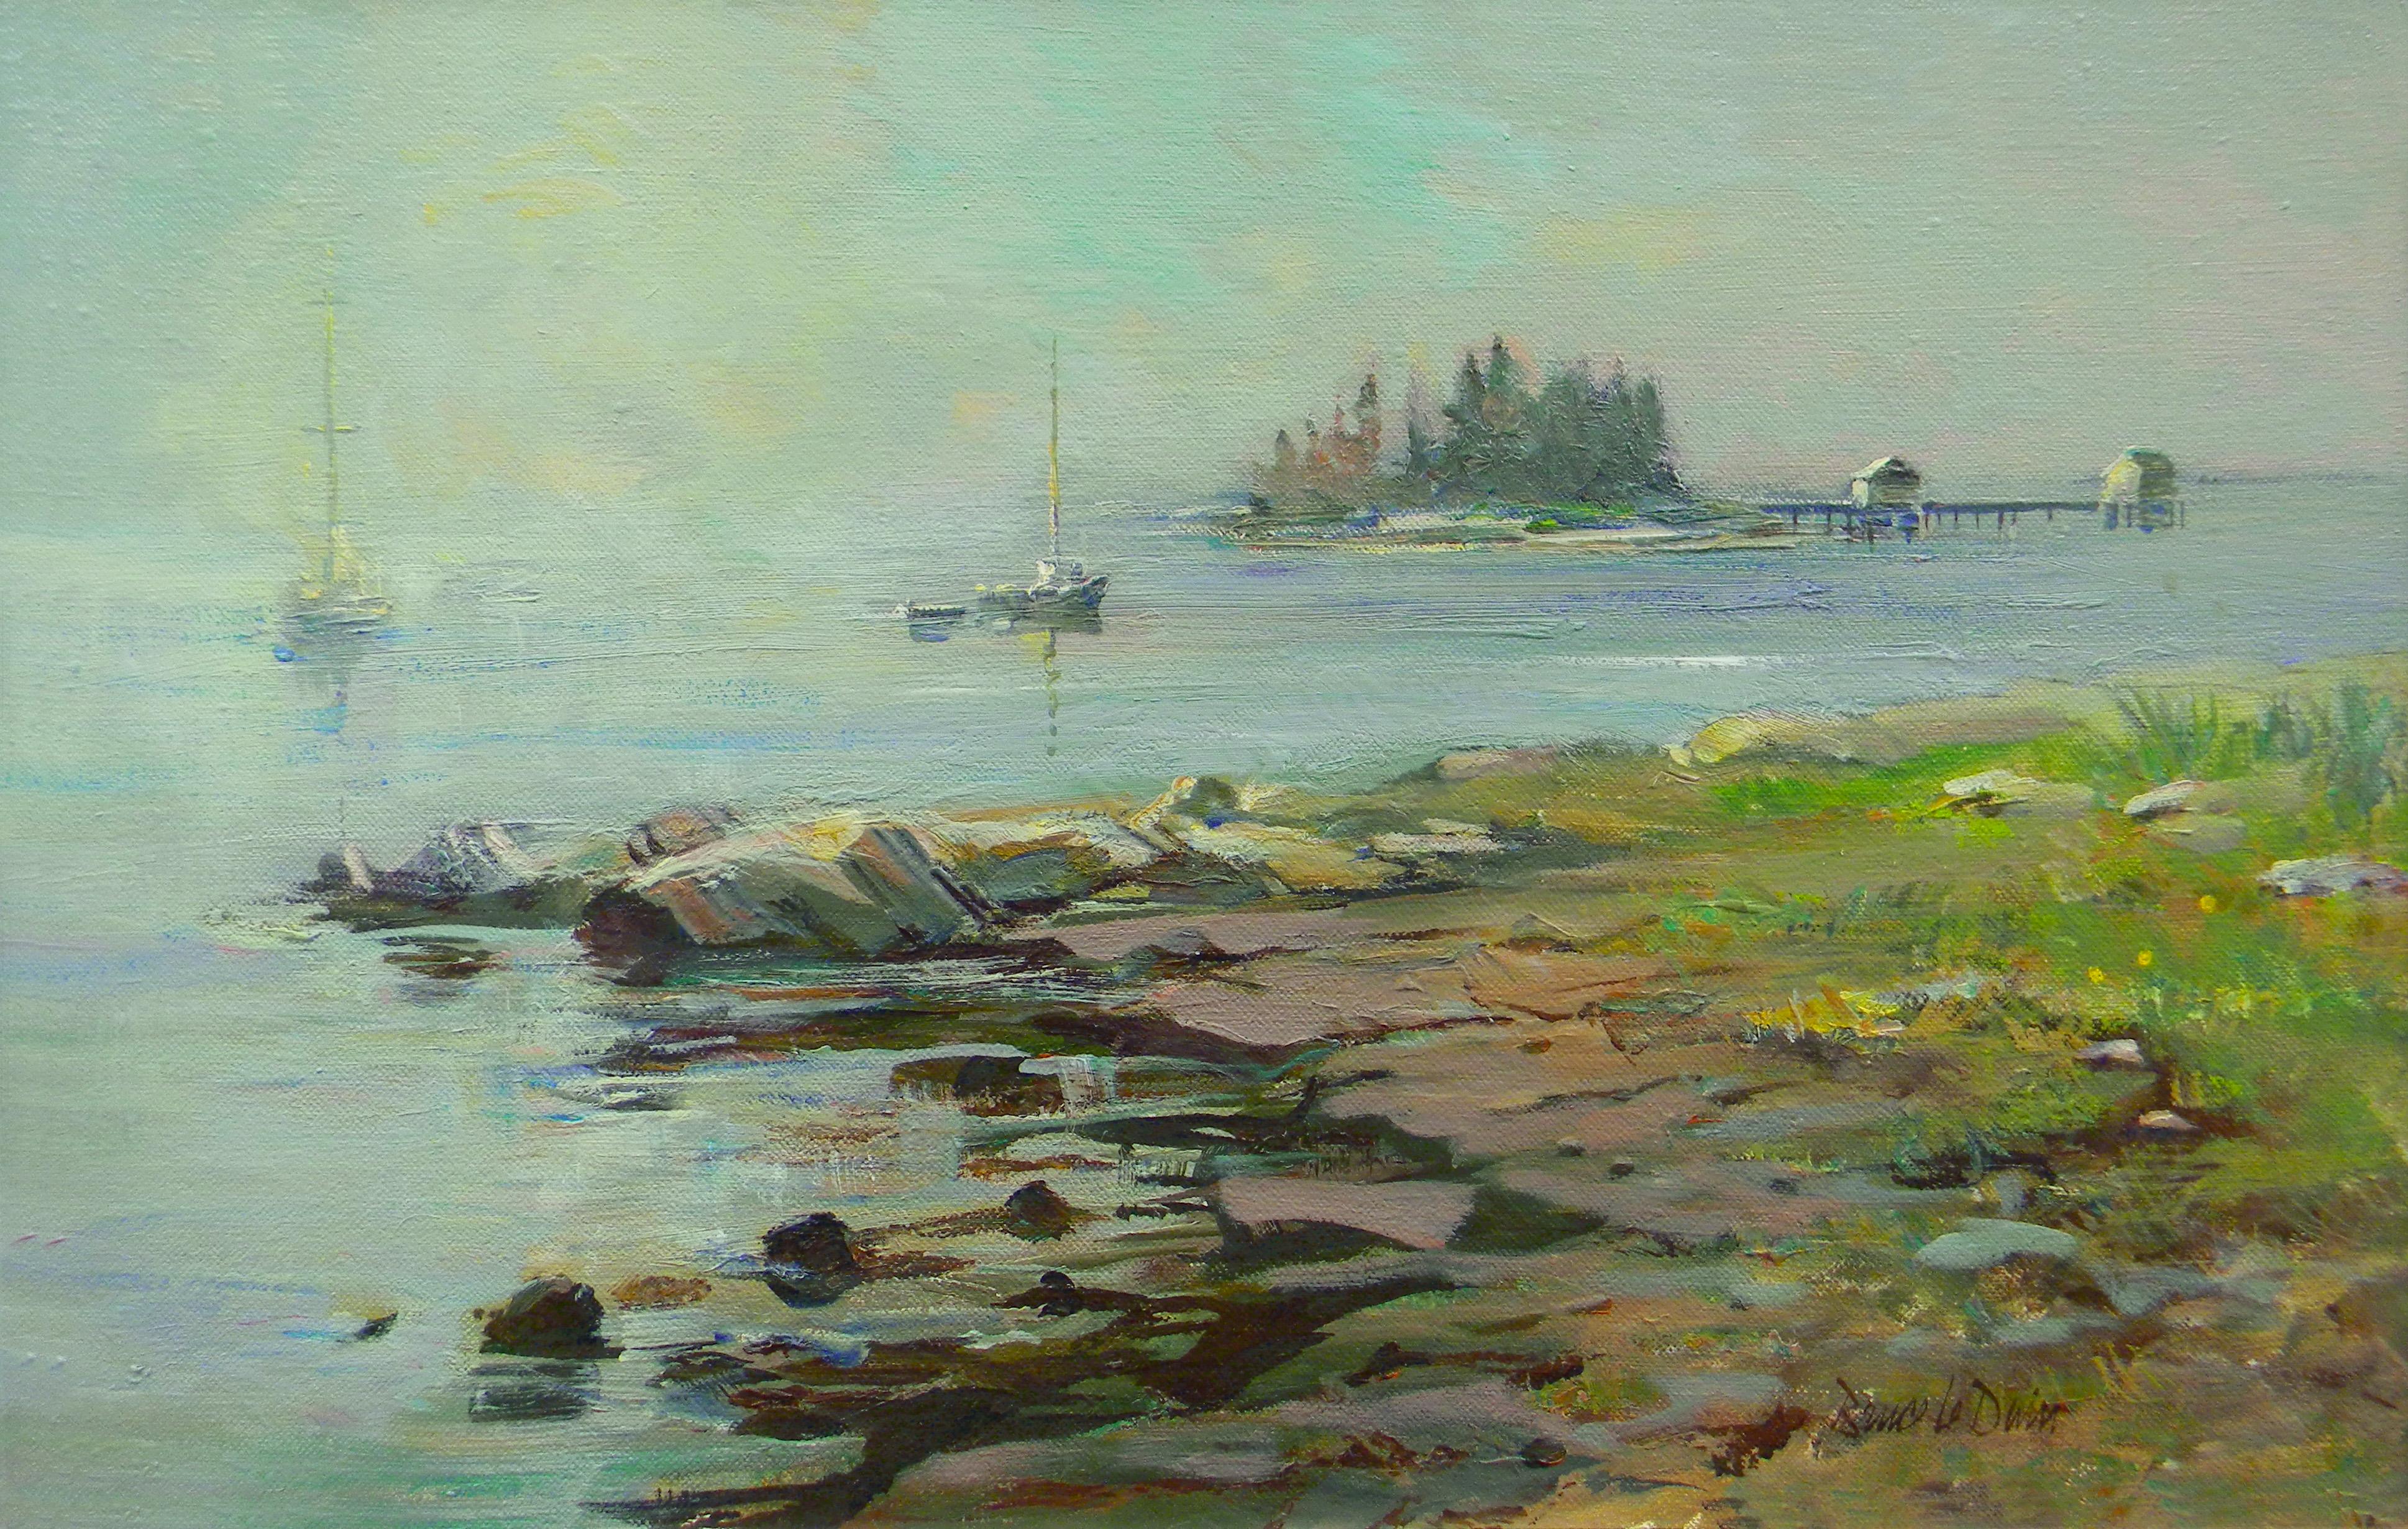 Sunrise, Fog Lifting, Jericho Bay, Deer Isle, Maine